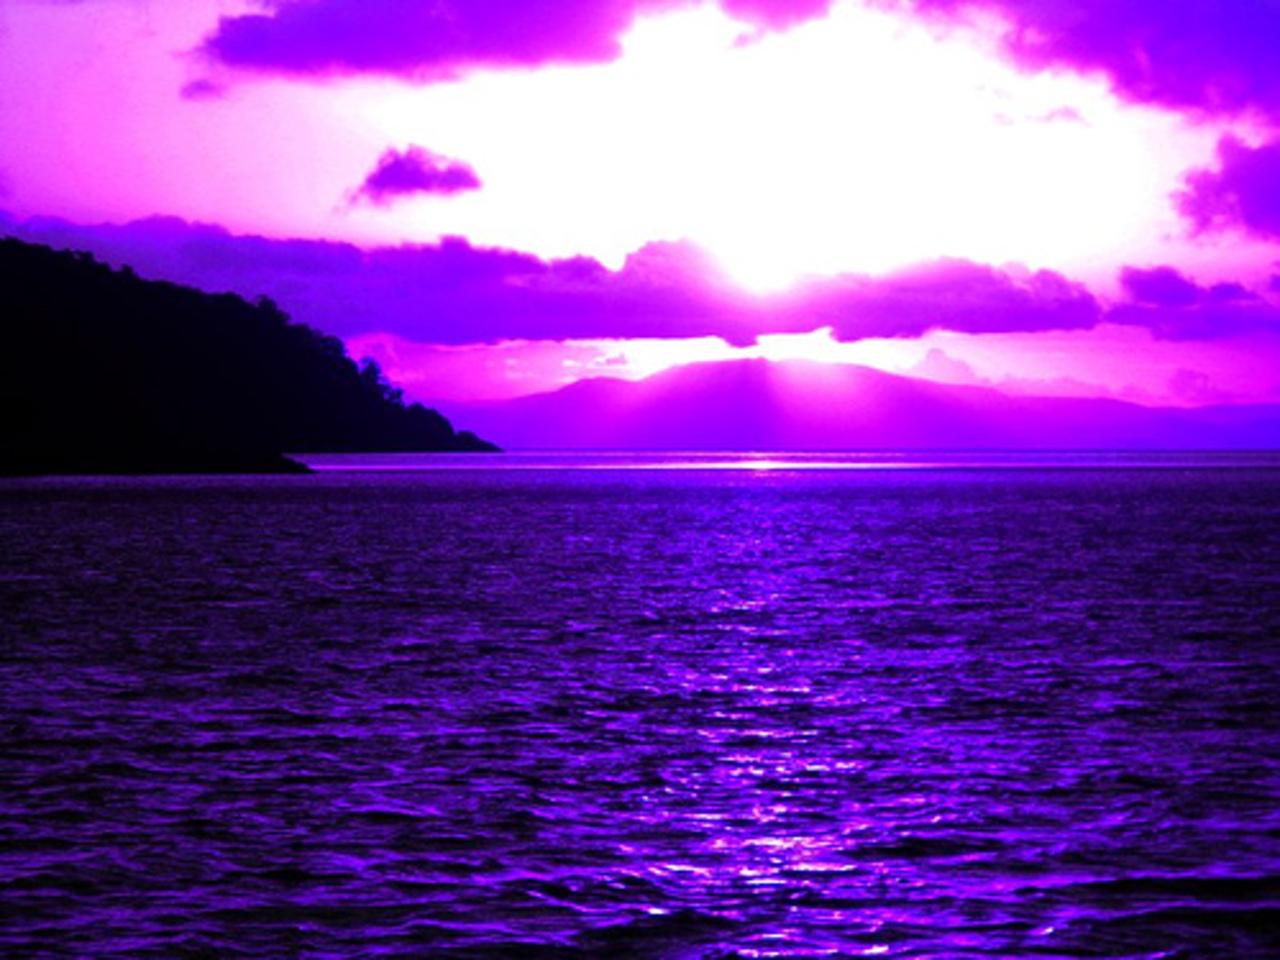 Purple Sunset 1280x960